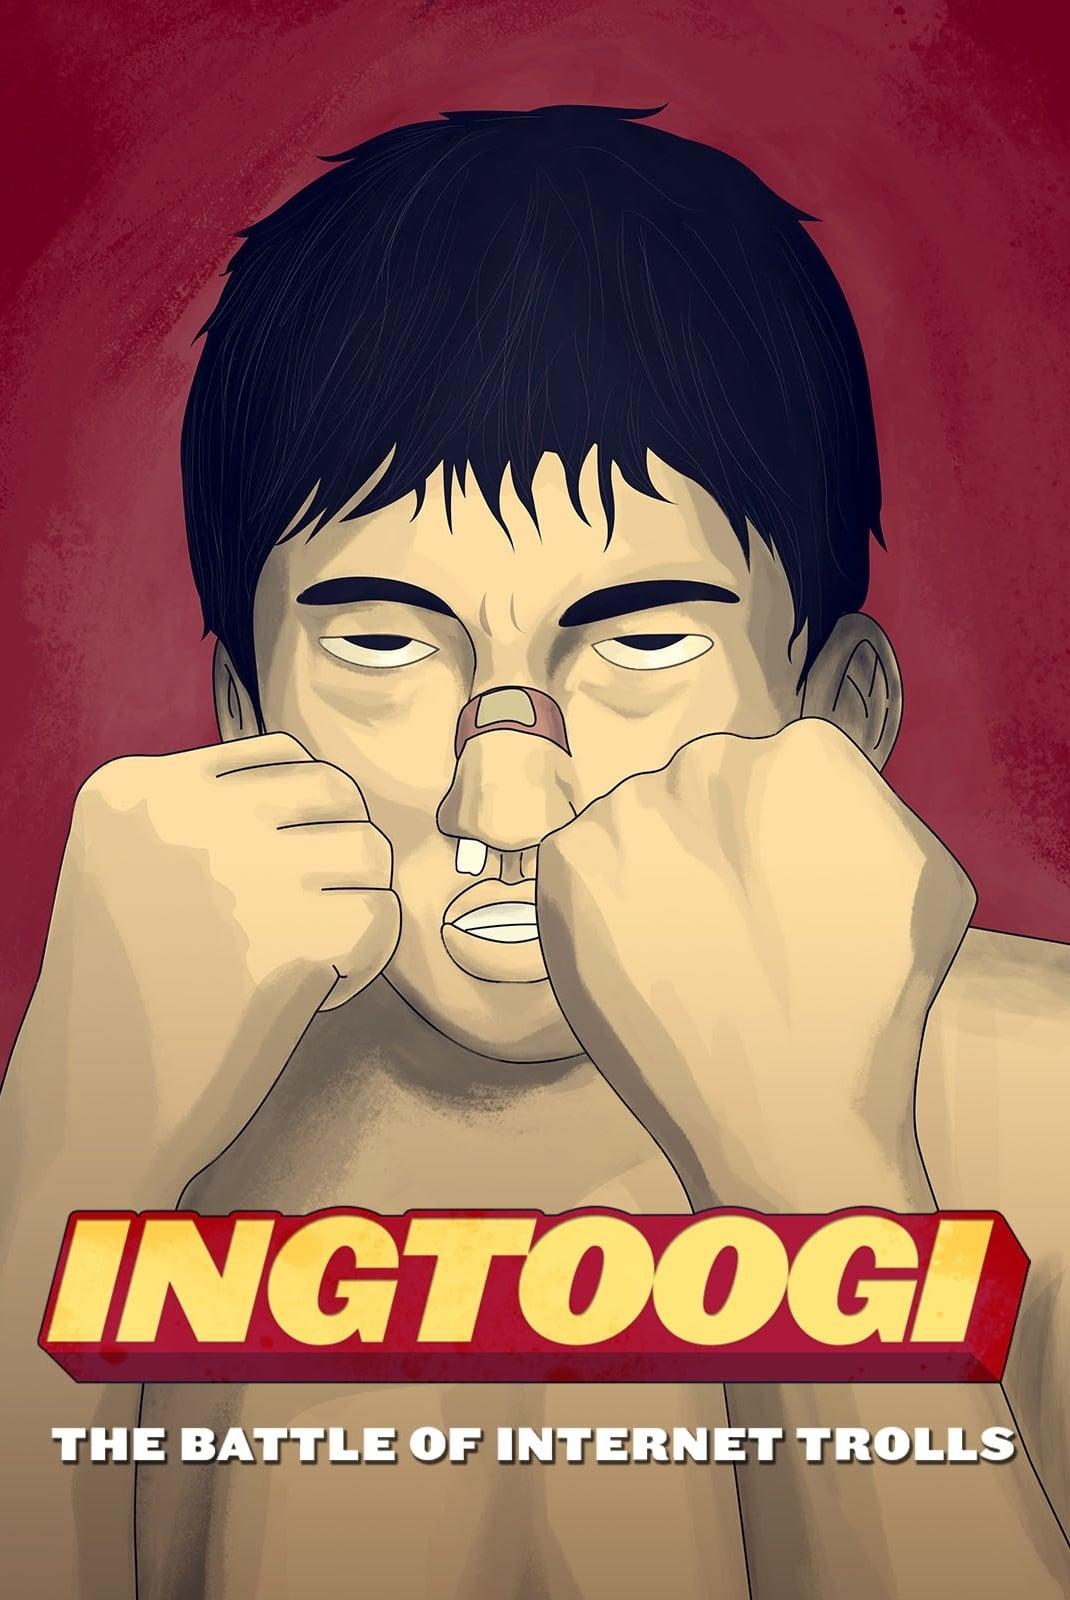 INGtoogi: La Batalla de los Trolls de Internet